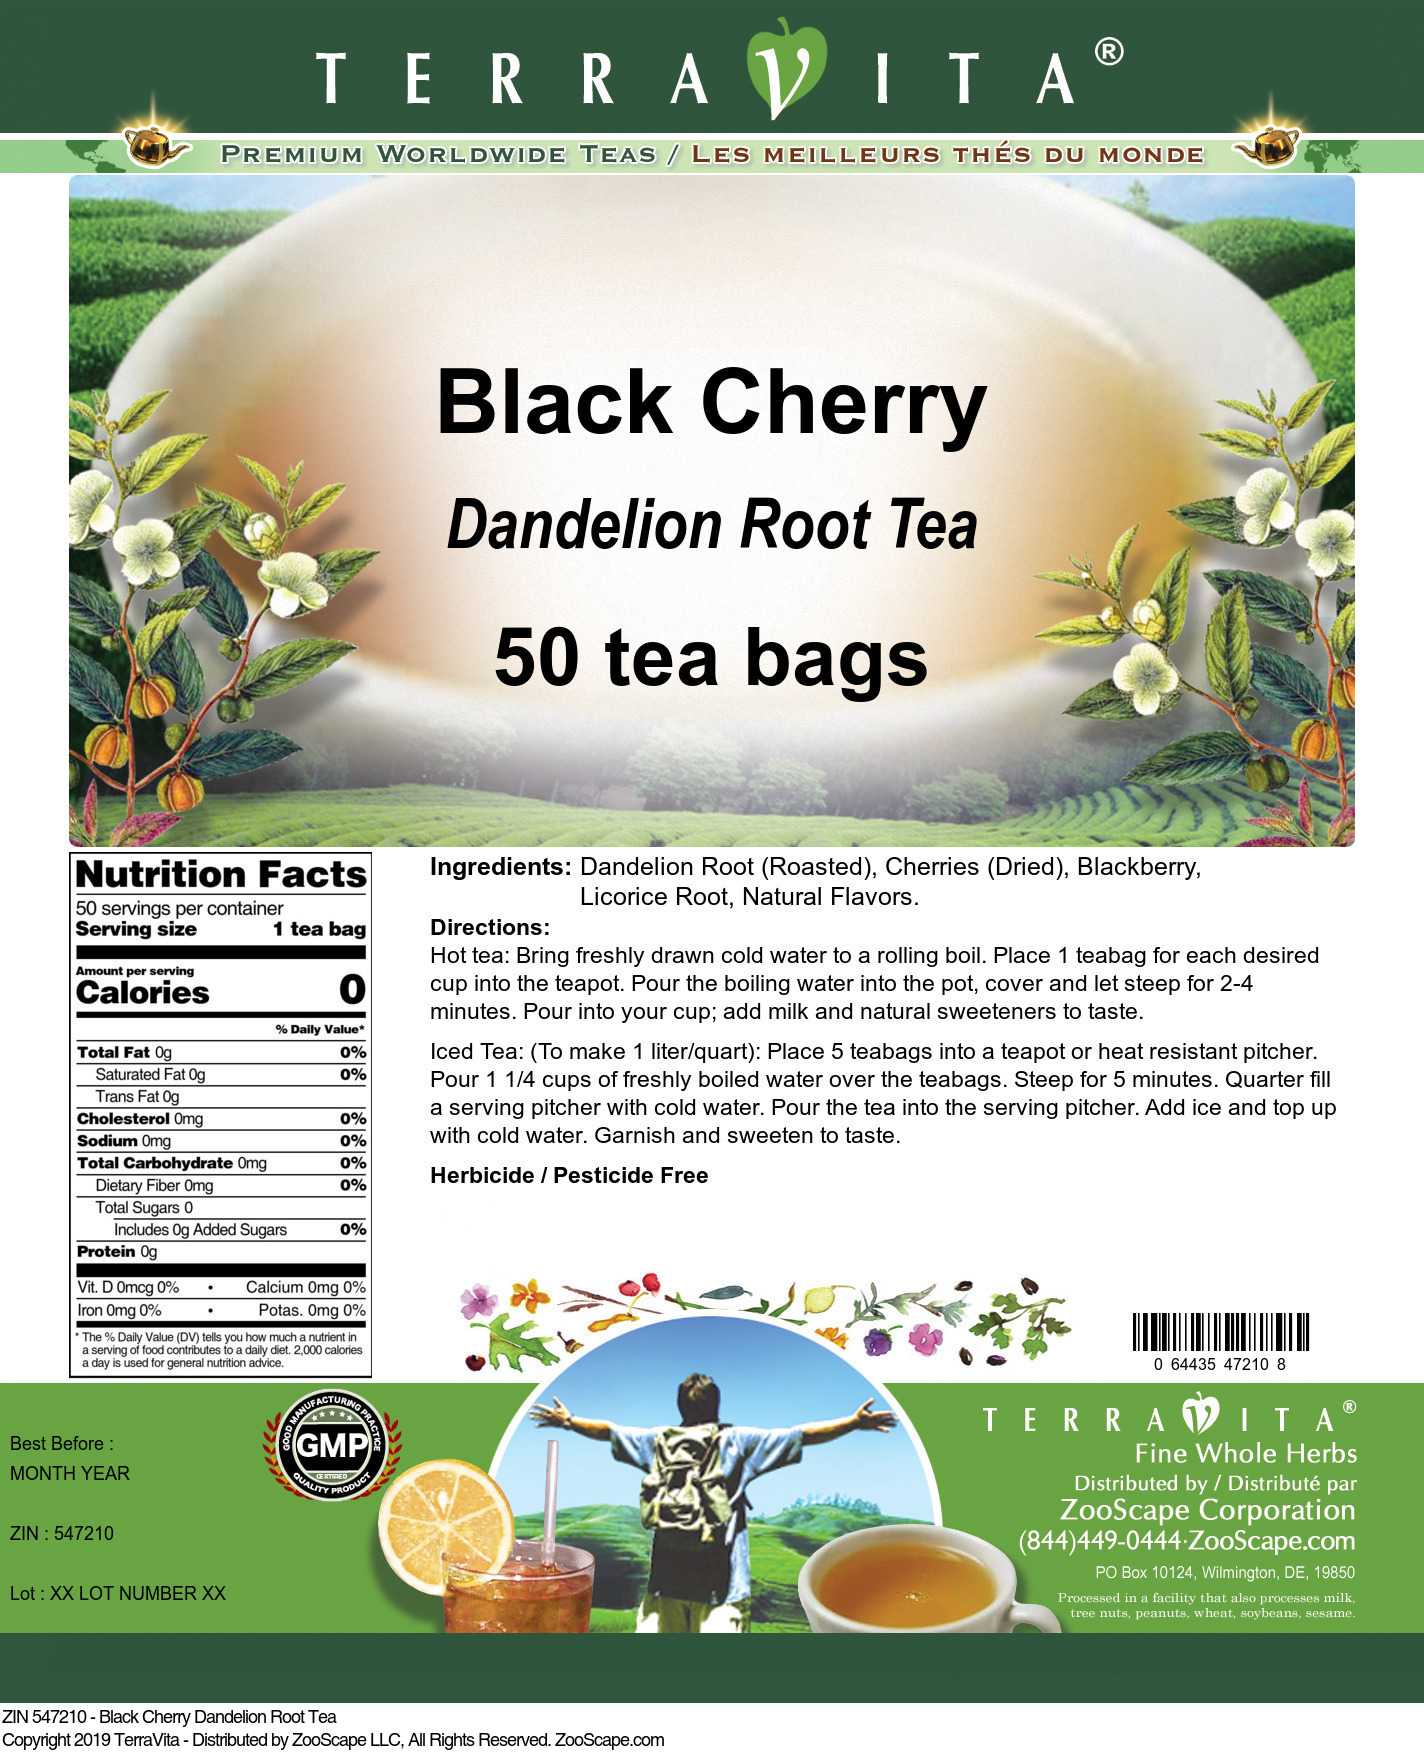 Black Cherry Dandelion Root Tea